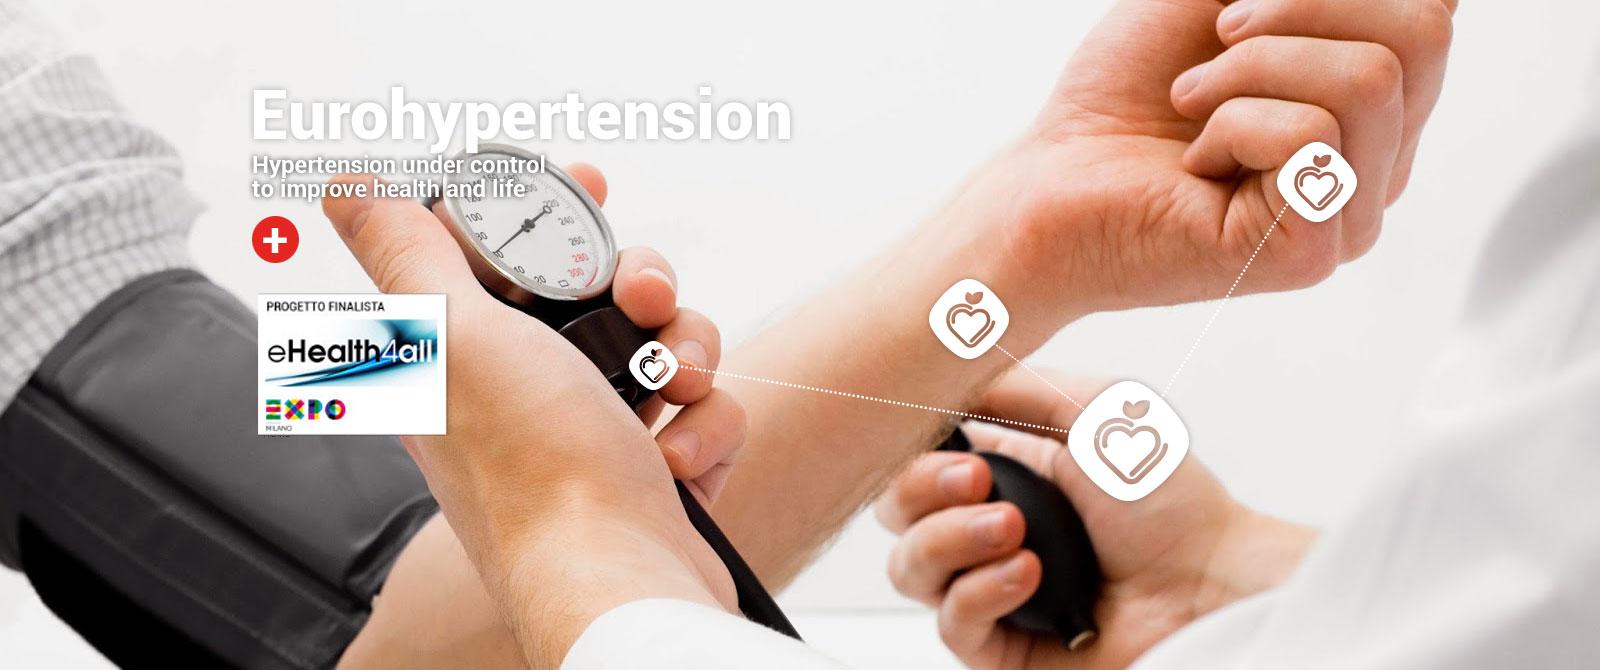 eurohypertension